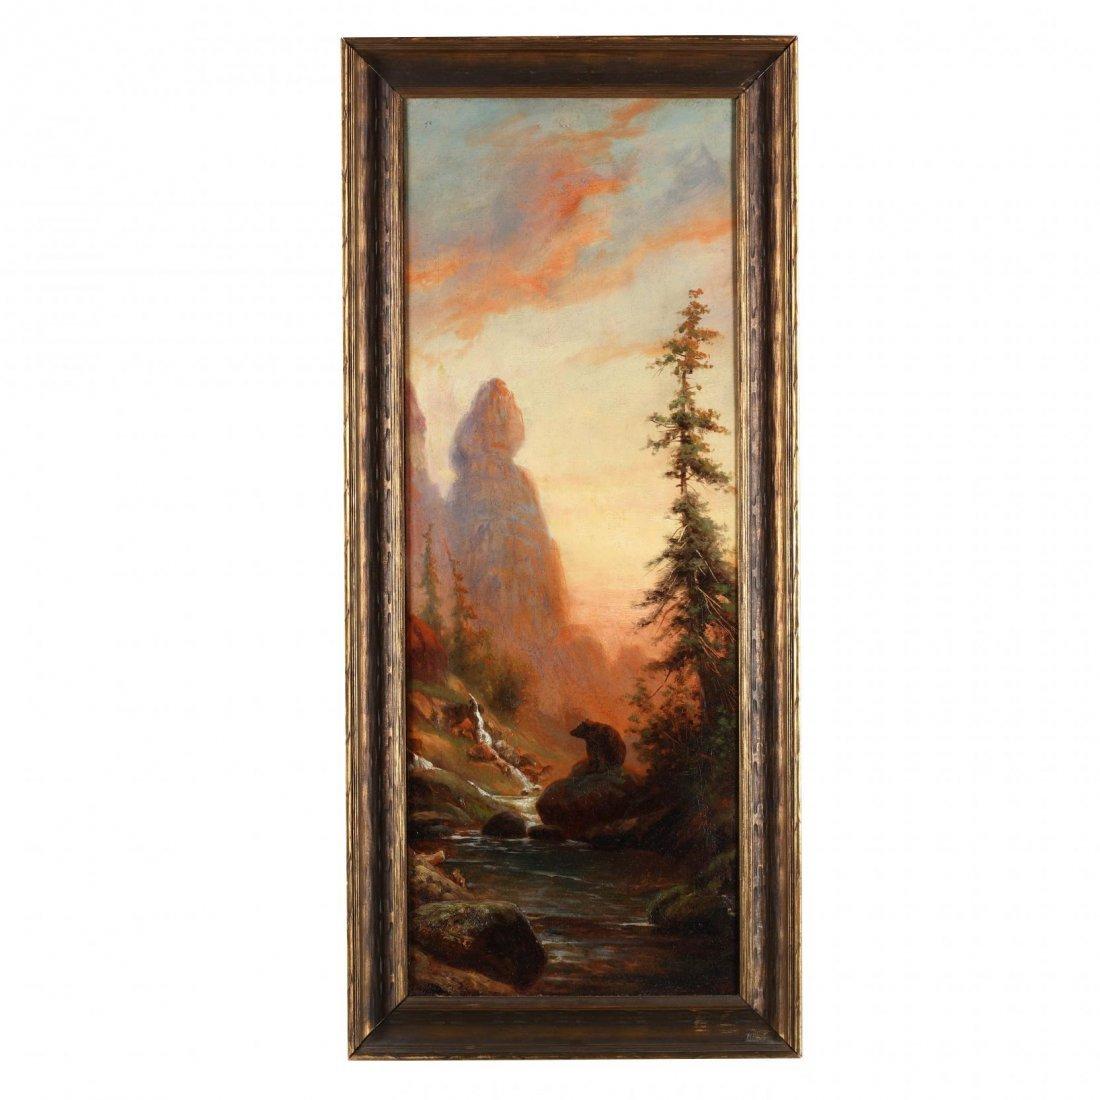 Edward Hill (American, 1843-1923), Western Landscape